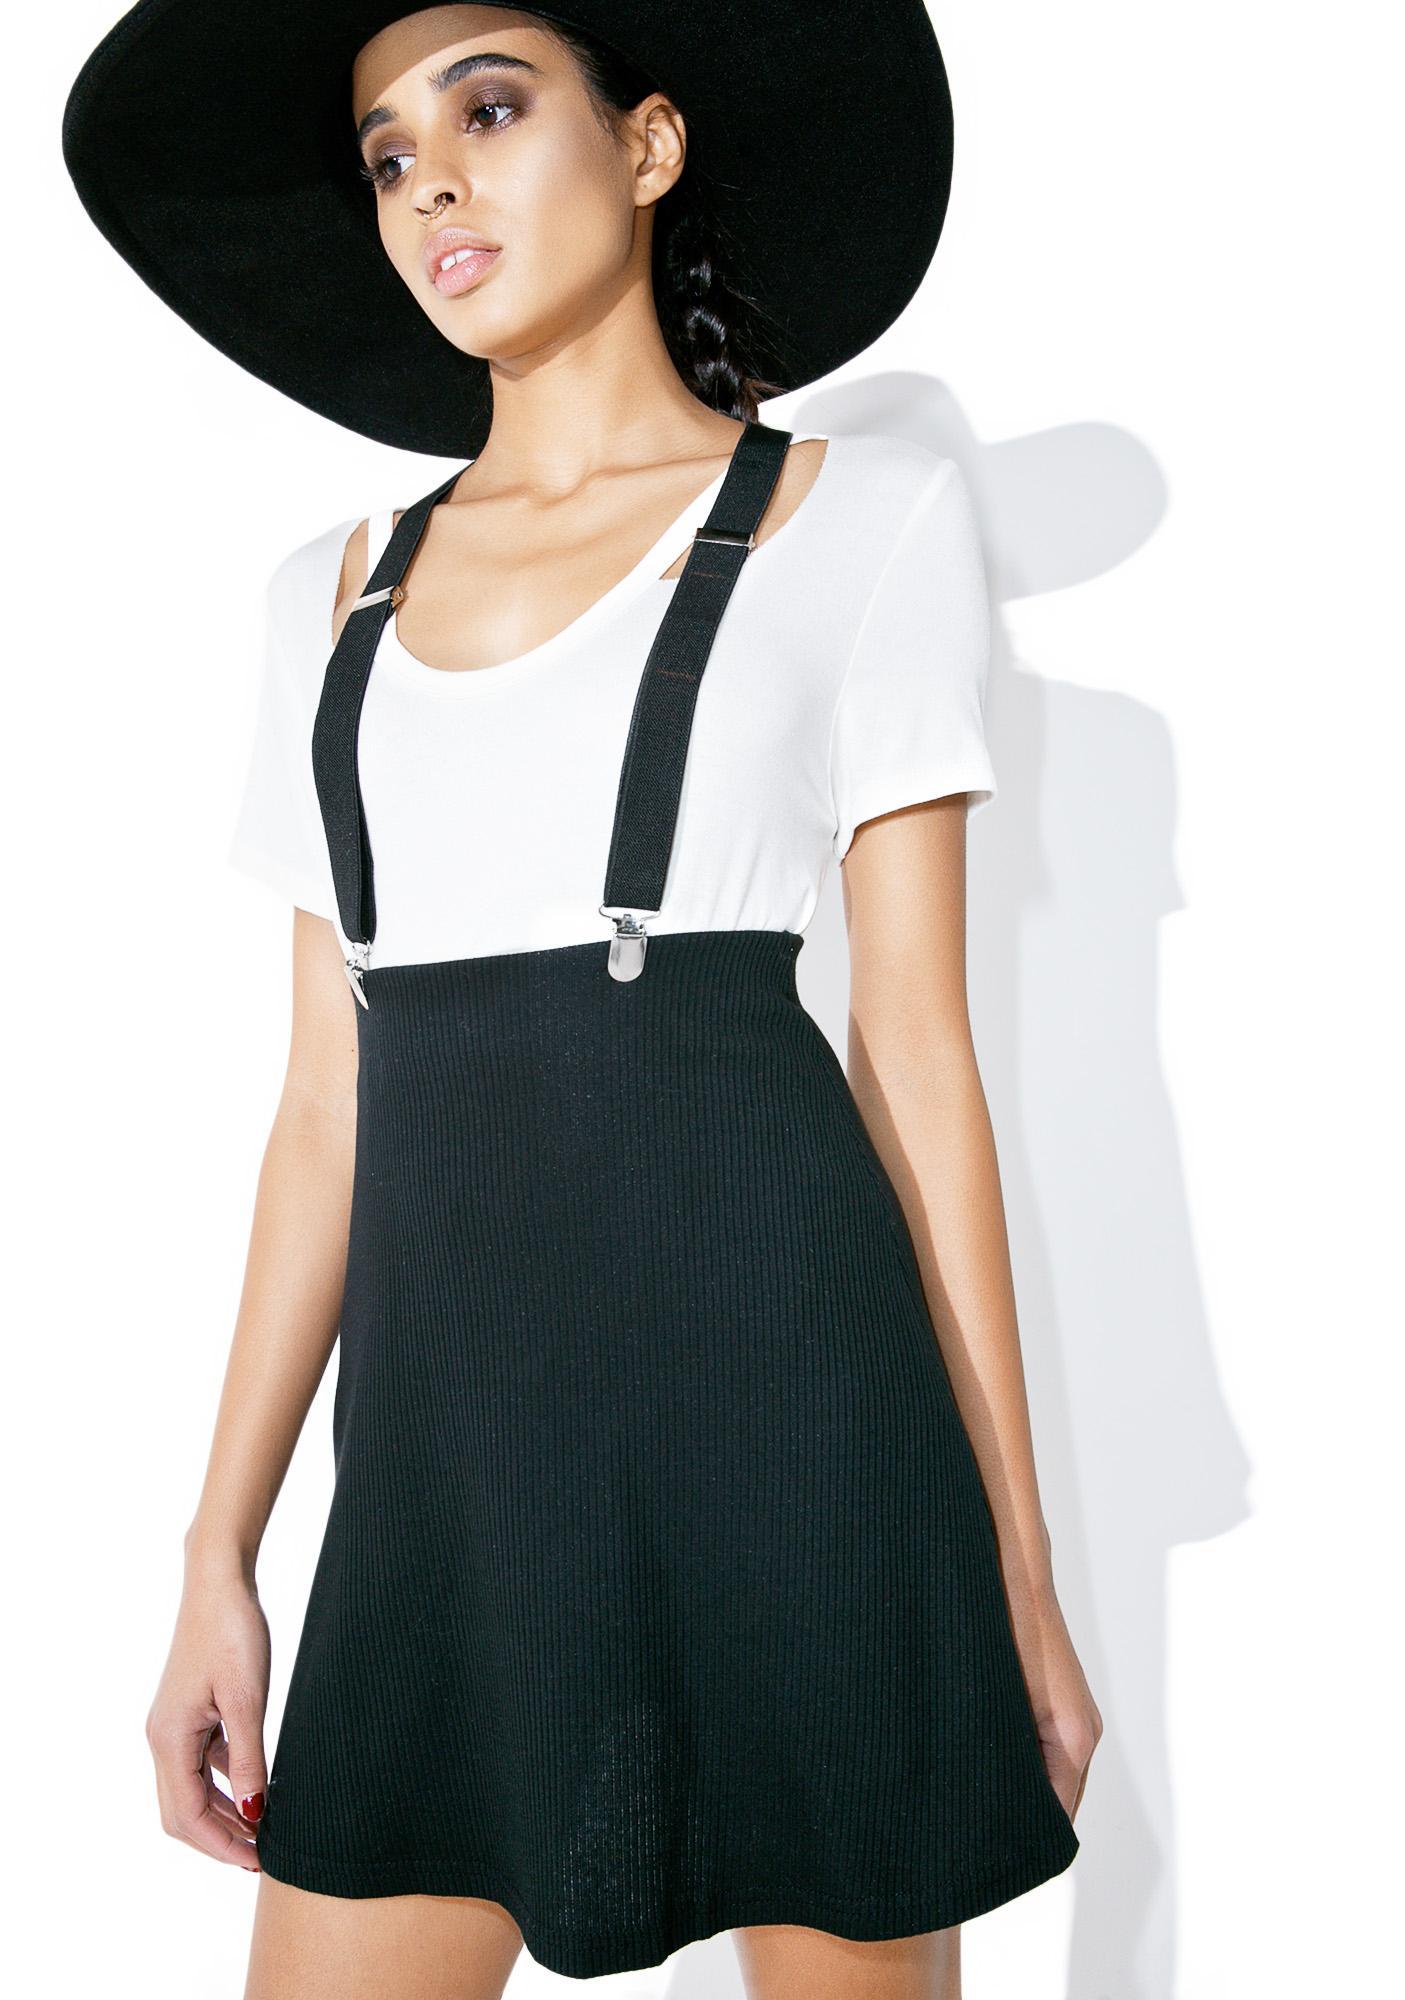 8b6c522a8f7 ... American Deadstock Grip Of Death Suspender Skirt ...